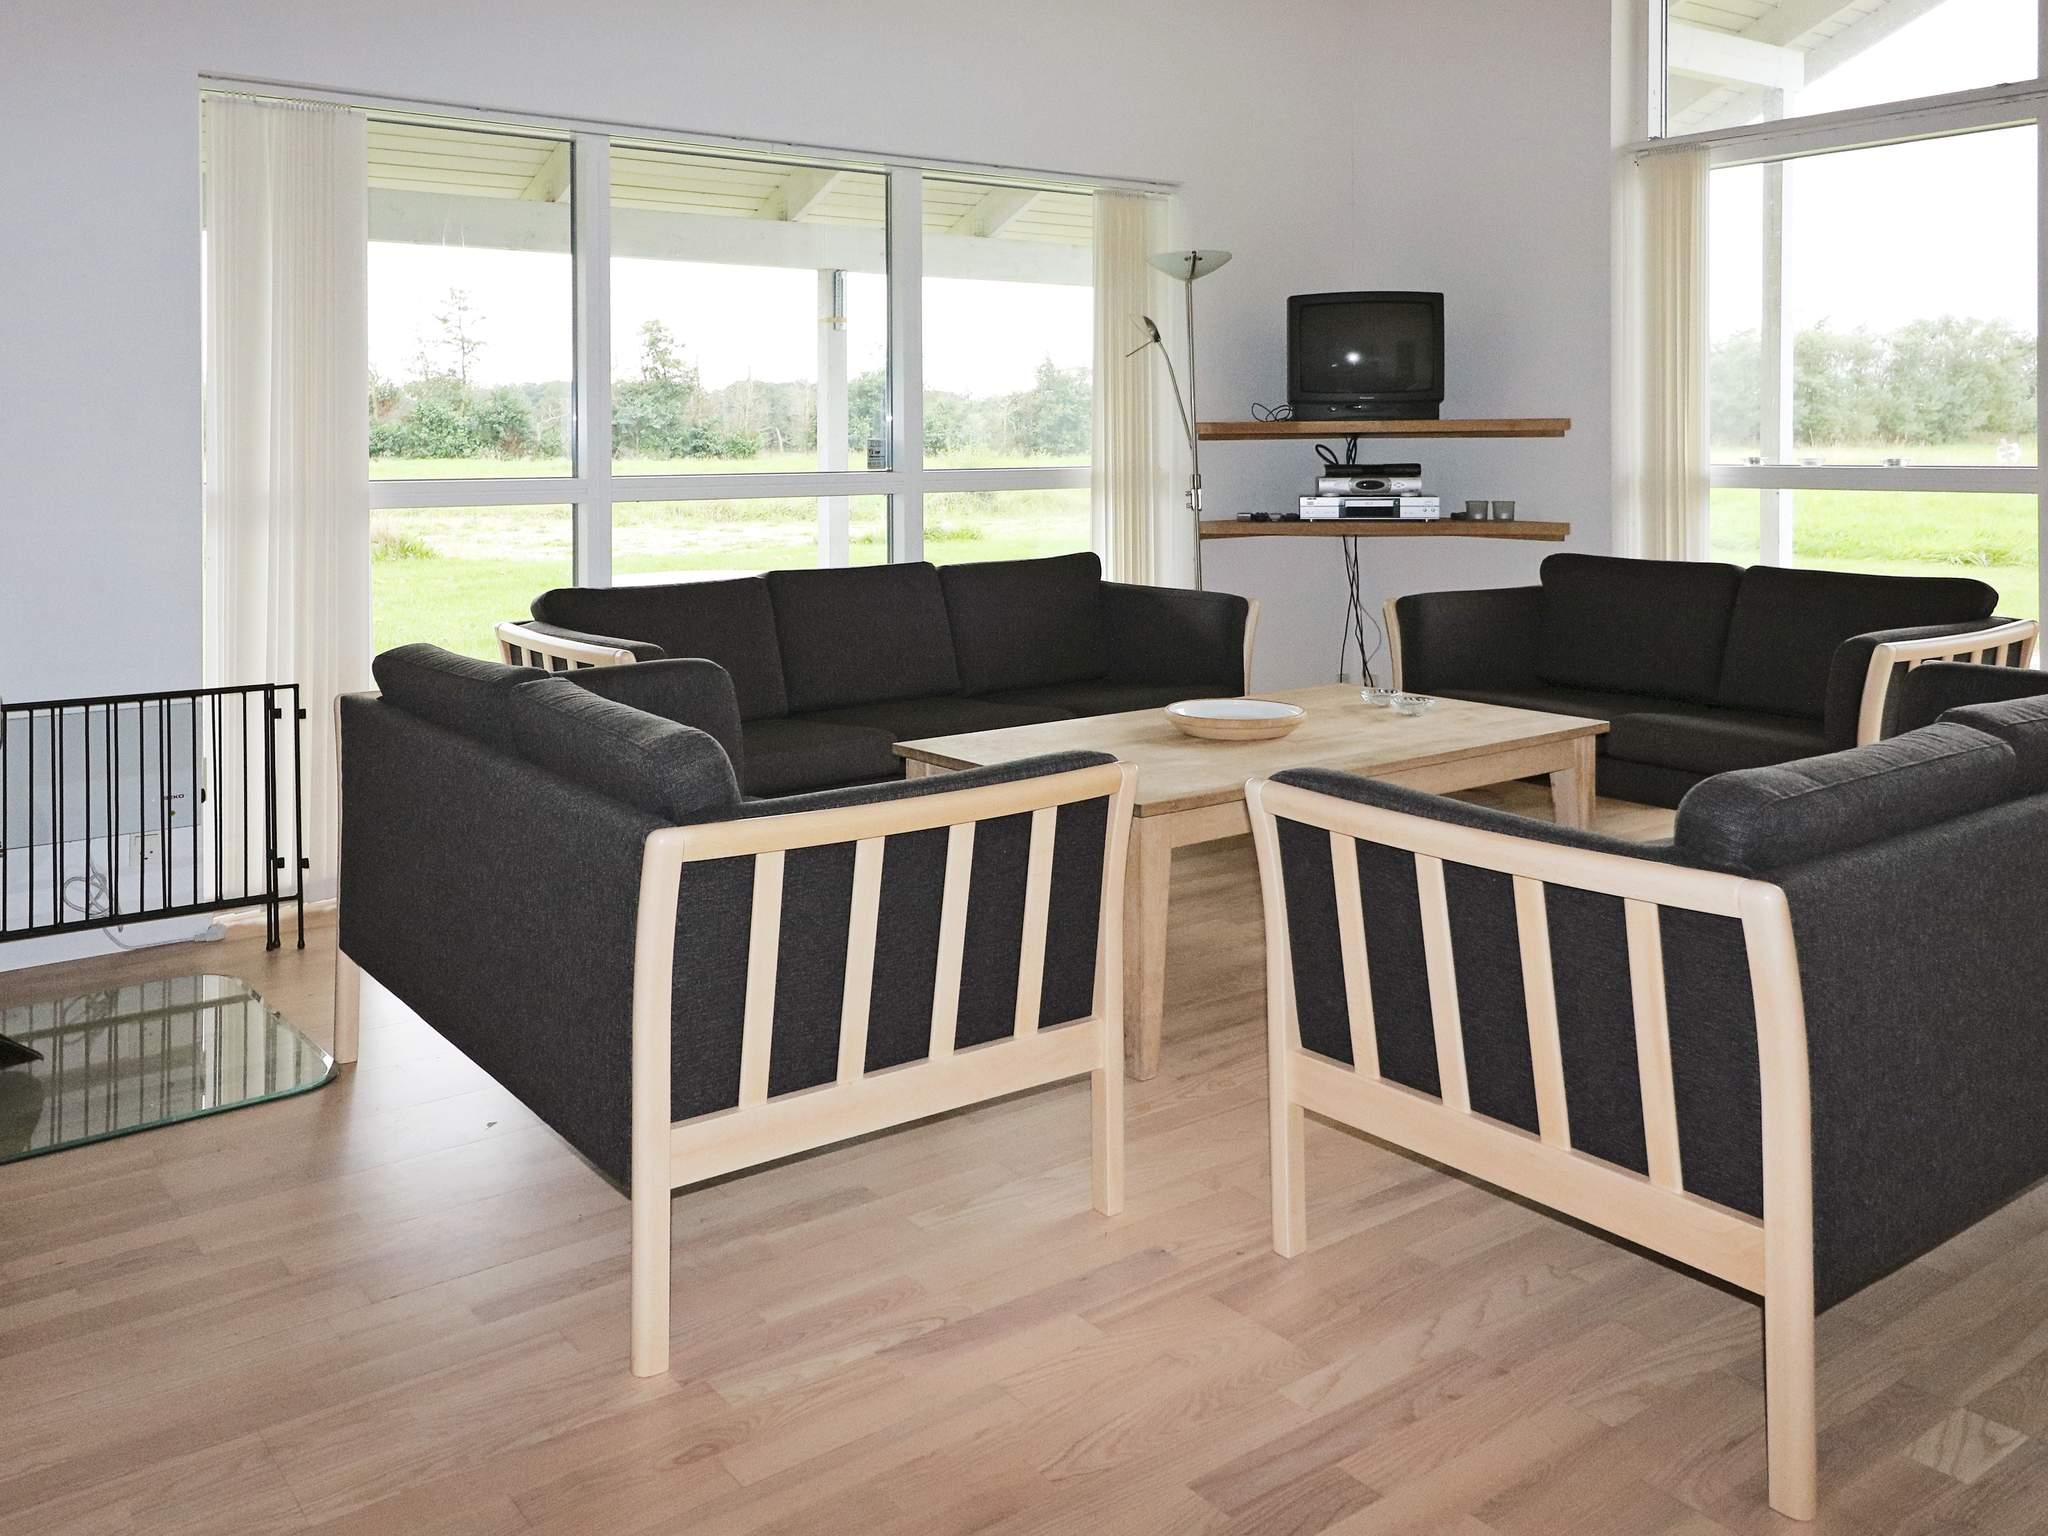 Ferienhaus Øster Hurup (681777), Øster Hurup, , Dänische Ostsee, Dänemark, Bild 3